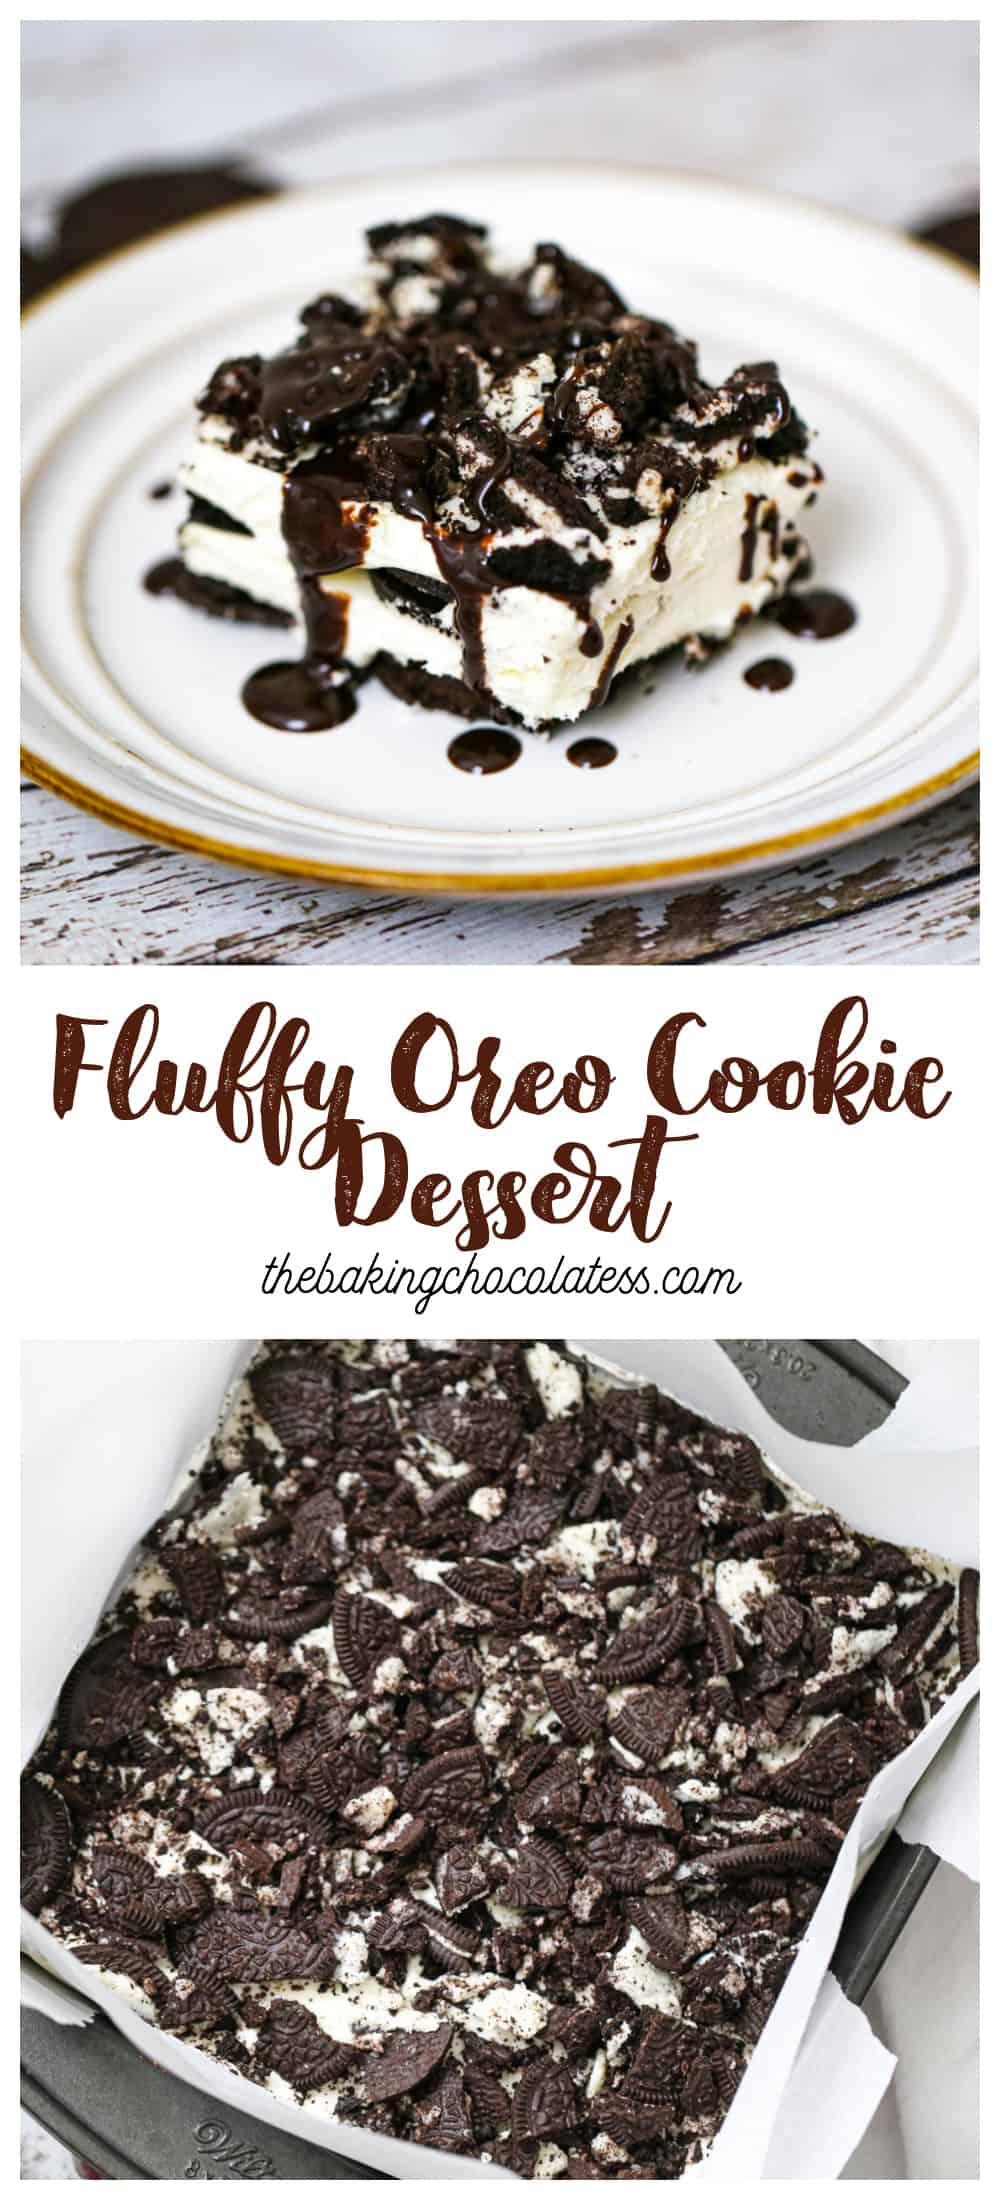 4 Ingredient Fluffy Oreo Dessert